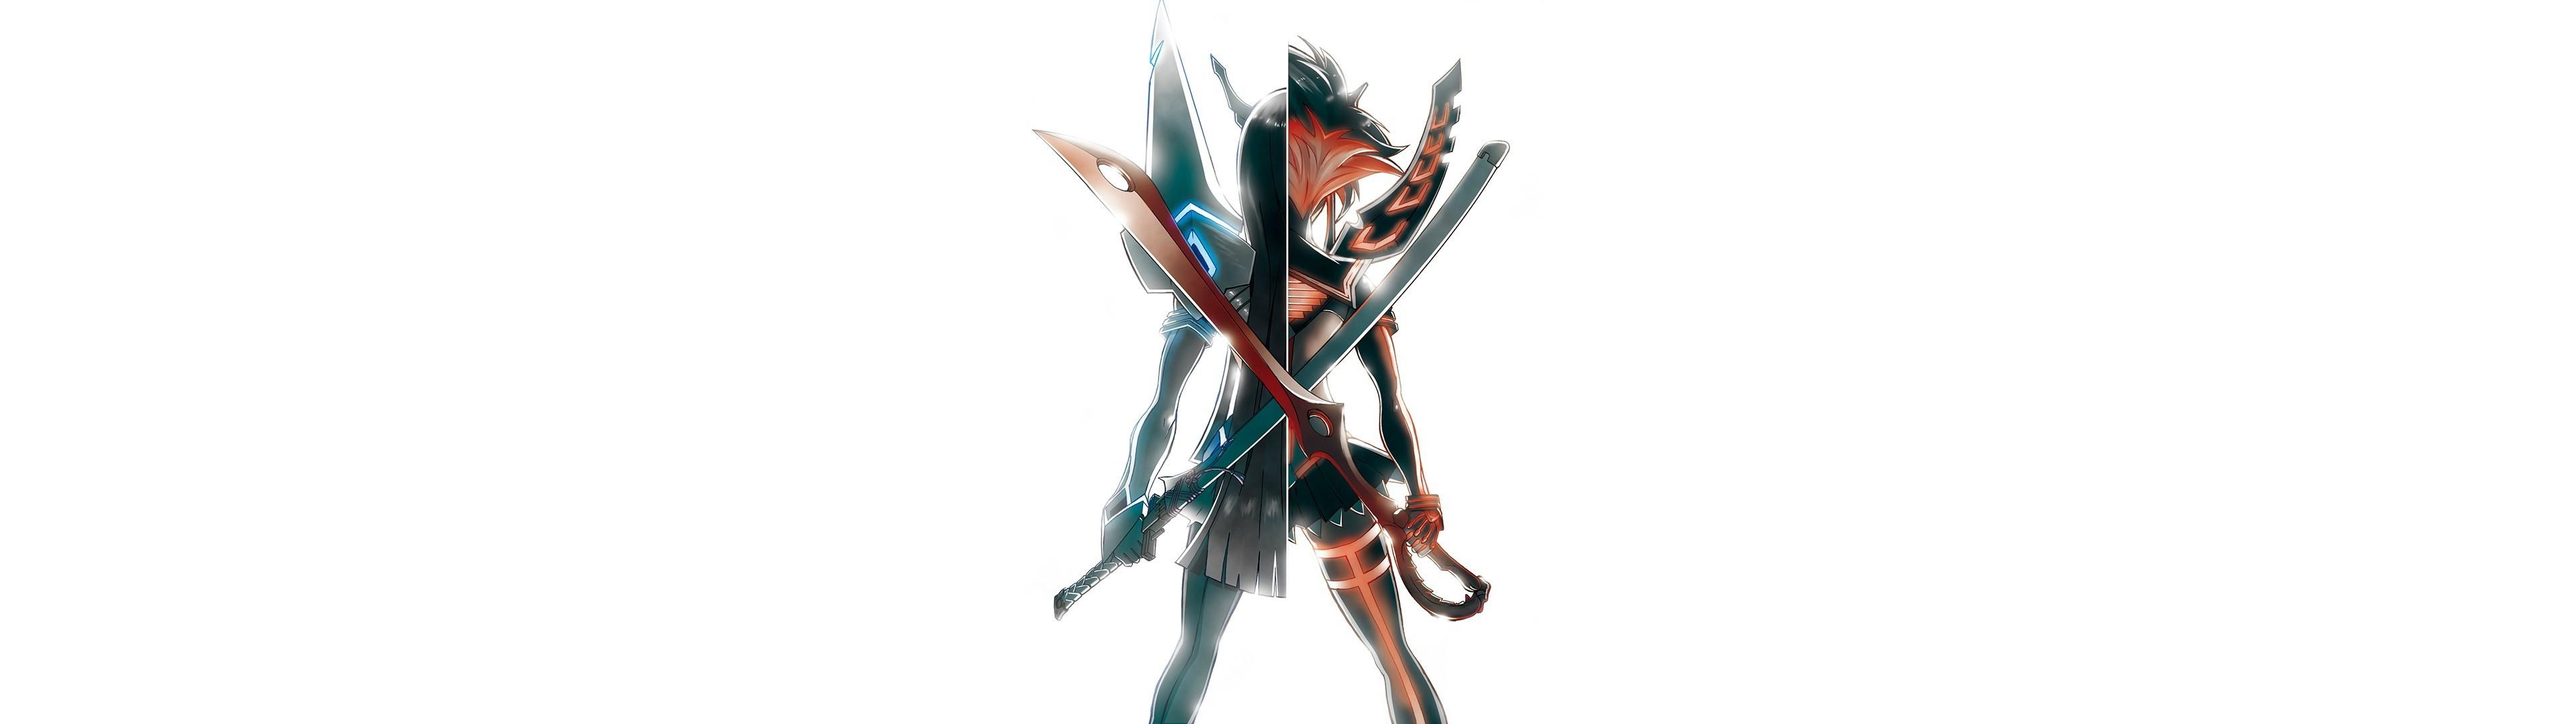 Anime Kill la Kill Matoi Ryuuko Kiryuin Satsuki